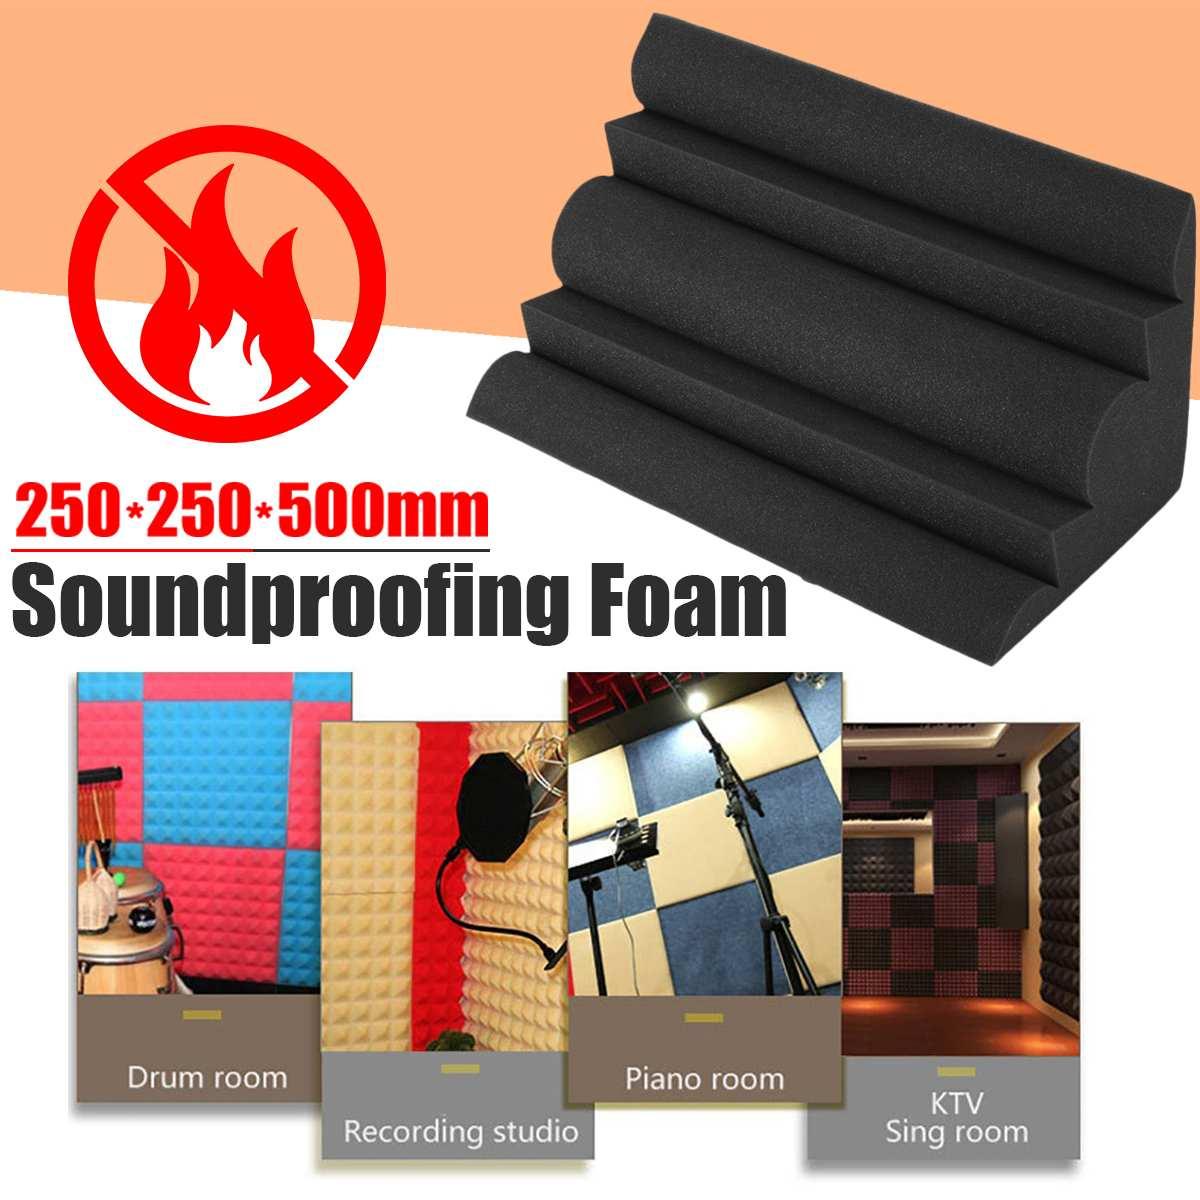 10Pcs 250x250x500mm Acoustic Bass Trap Acoustic Foam For Corner Wall Soundproof Sponge Studio Room Absorption Tiles Foam10Pcs 250x250x500mm Acoustic Bass Trap Acoustic Foam For Corner Wall Soundproof Sponge Studio Room Absorption Tiles Foam